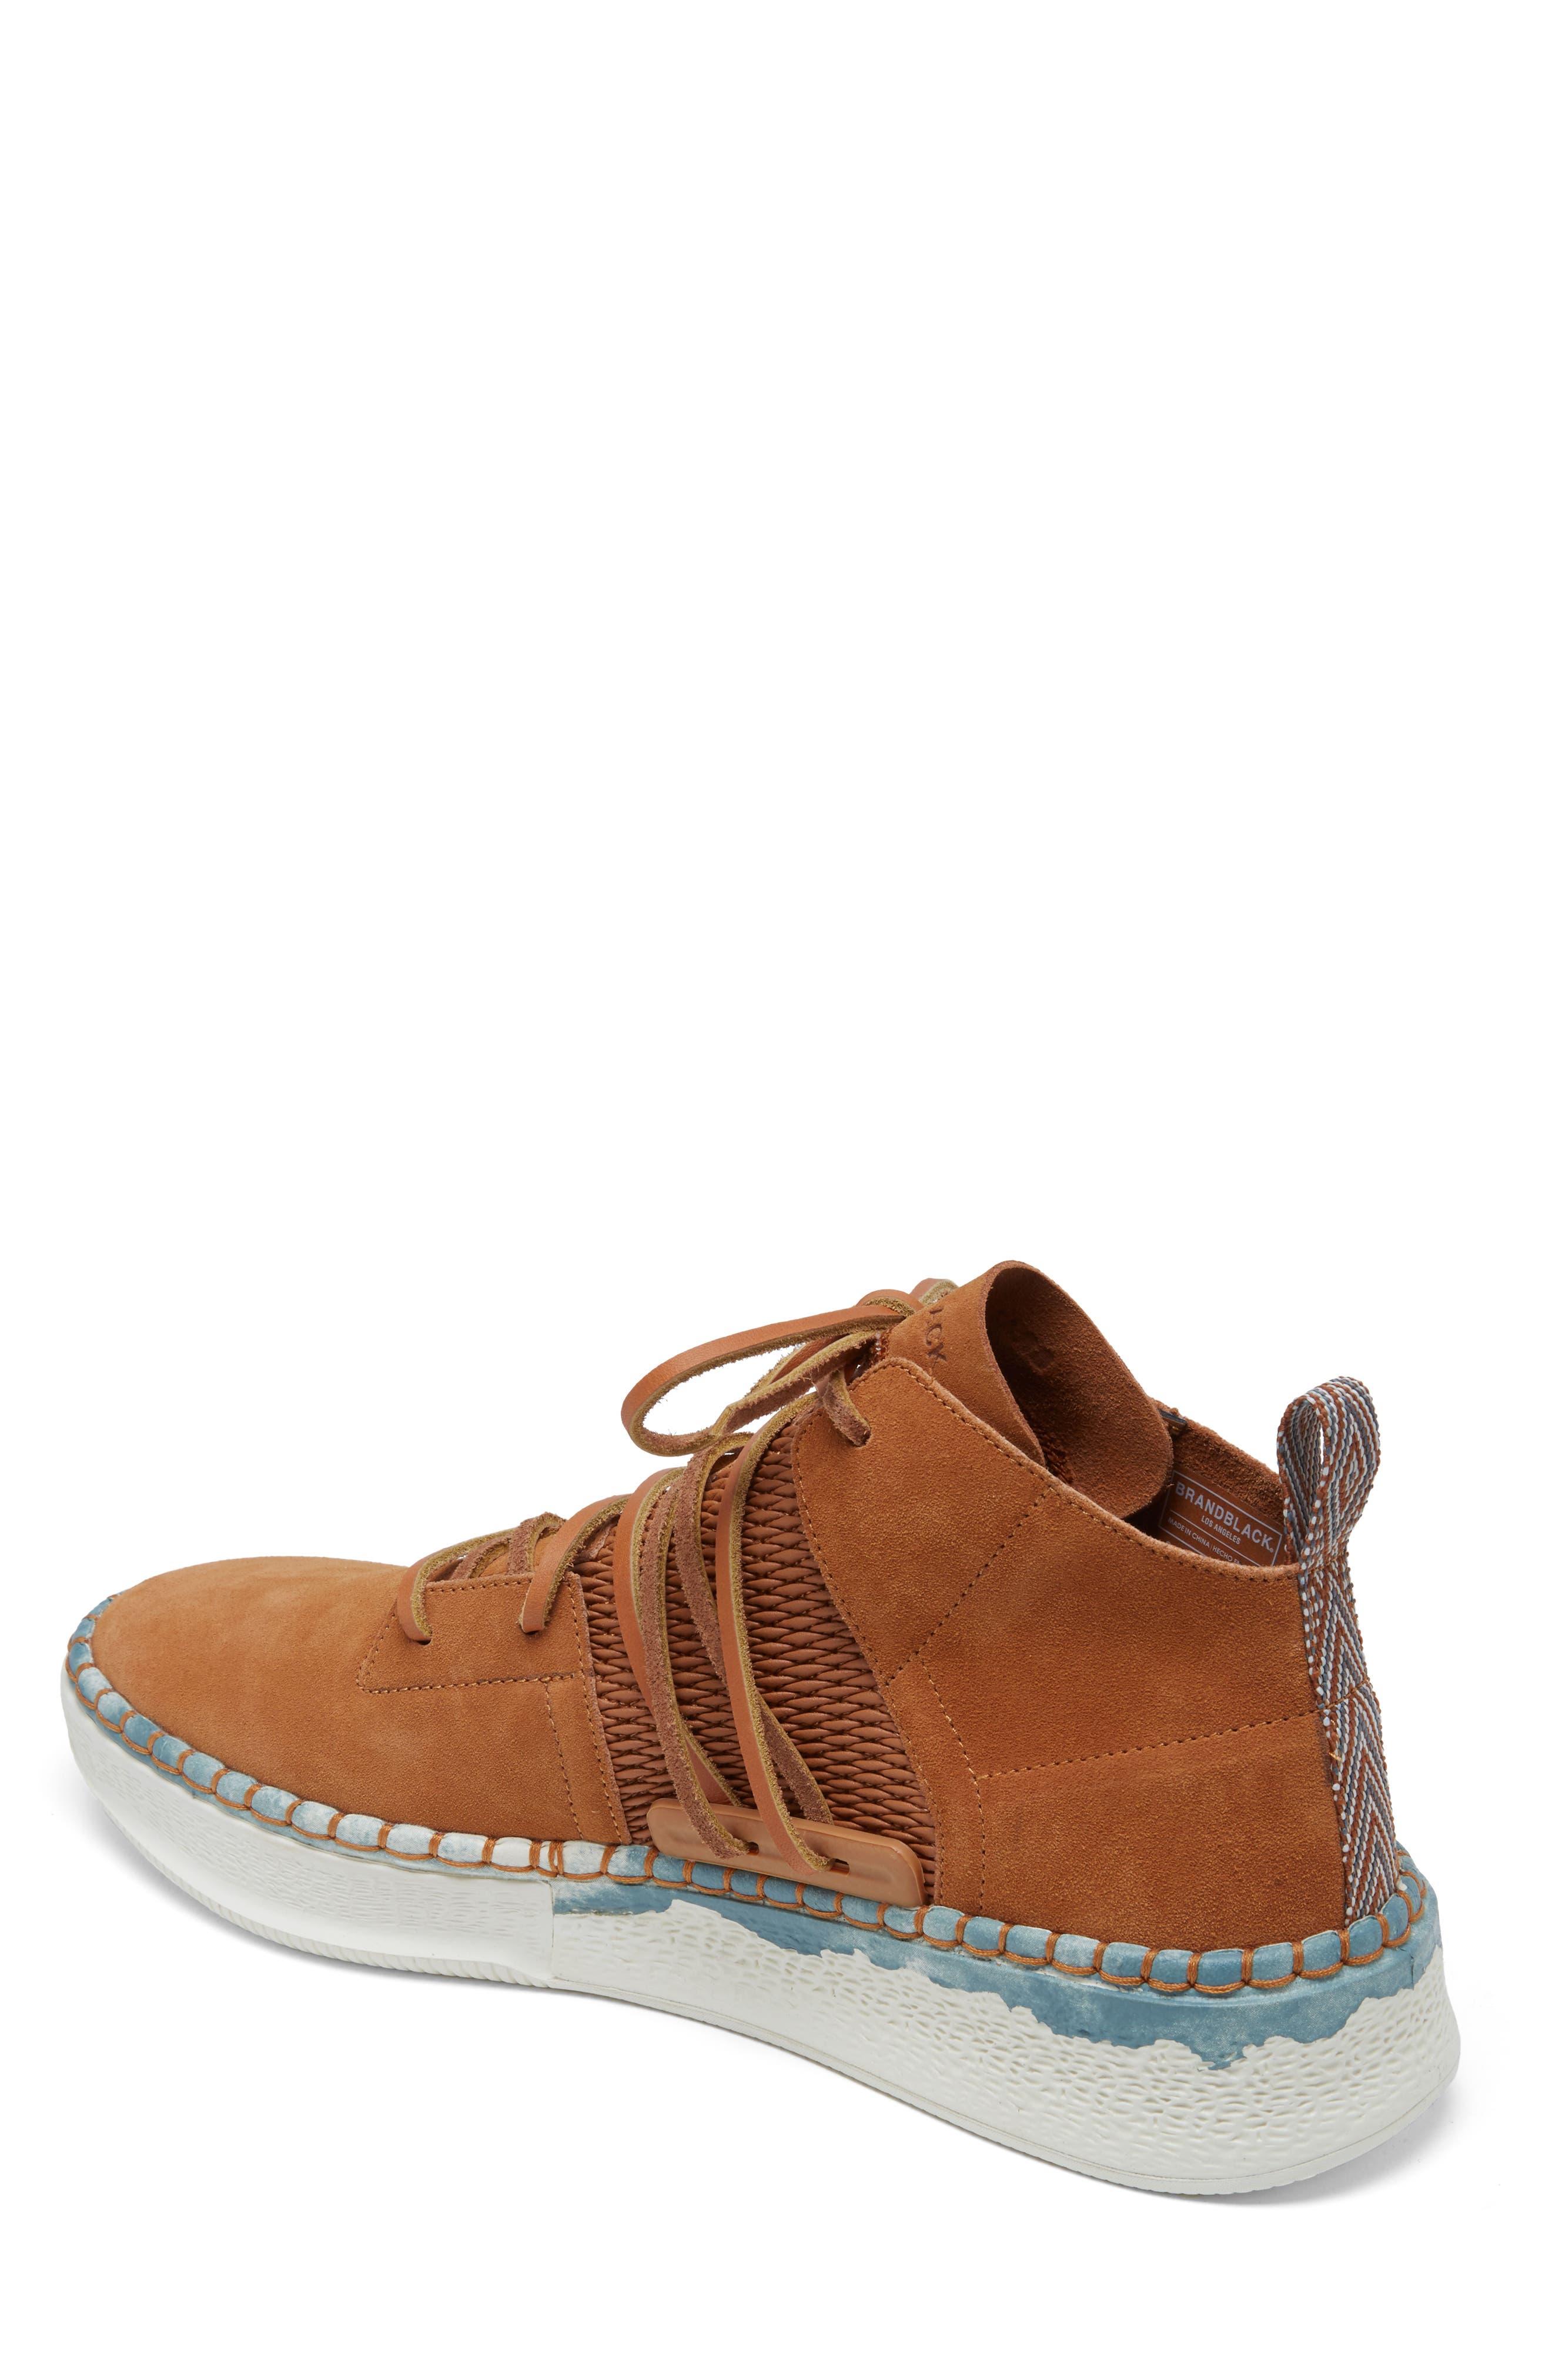 Delta Sneaker,                             Alternate thumbnail 2, color,                             200